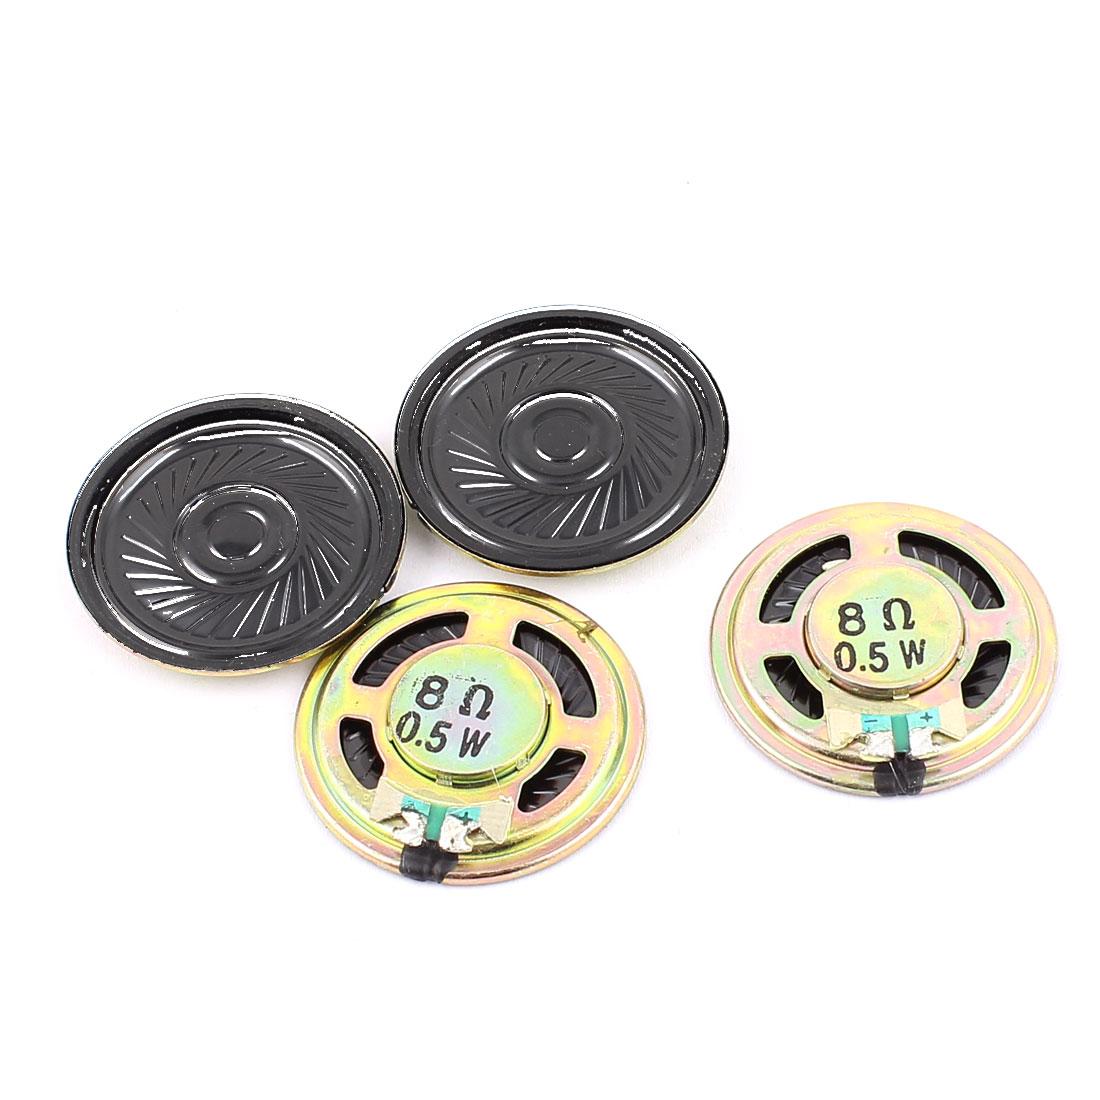 4 Pcs 36mm 8 Ohm 0.5W Metal External Magnetic Speaker Loudspeaker Gold Tone